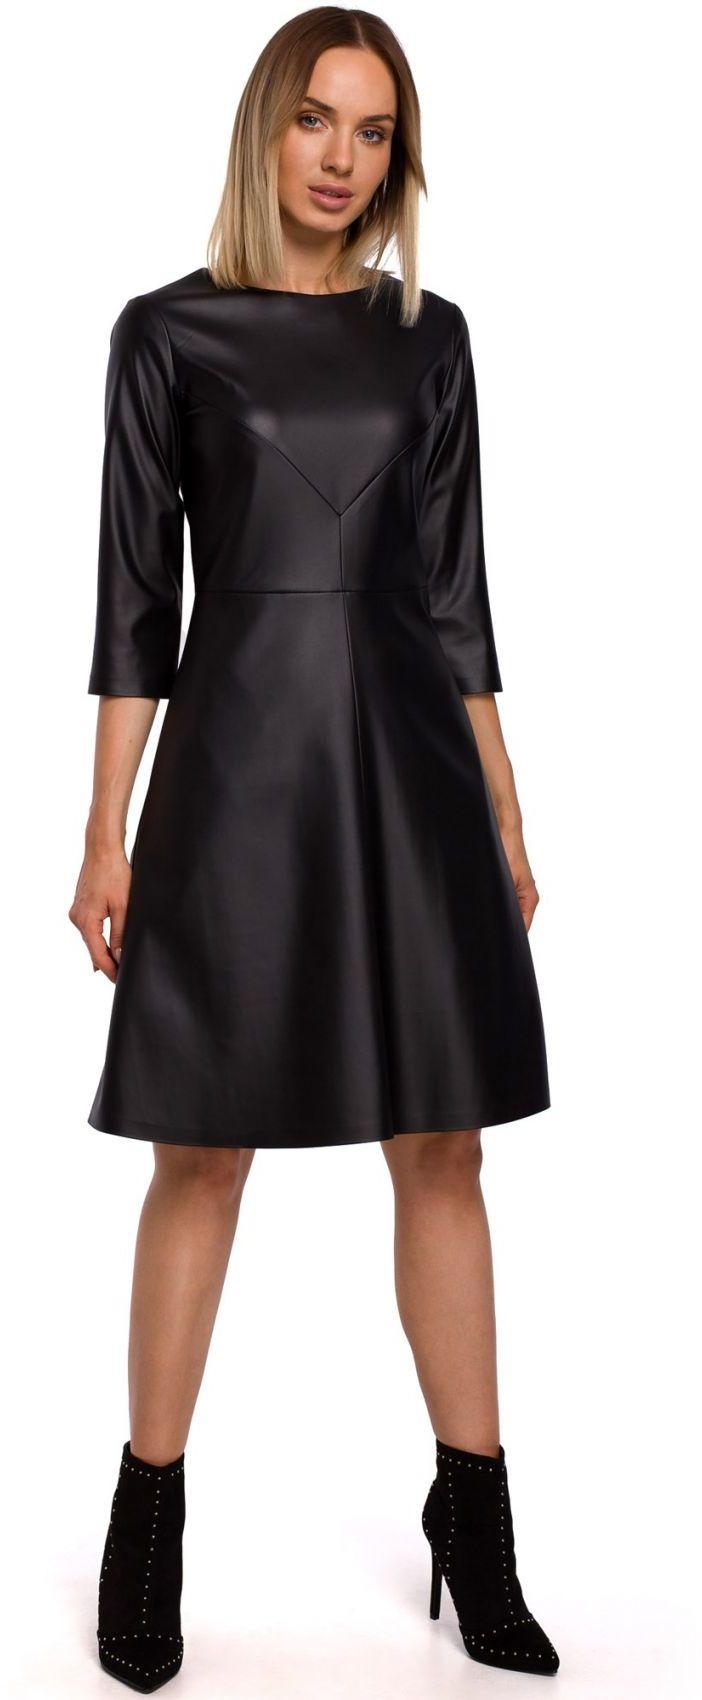 M541 Sukienka ze sztucznej skóry - czarna